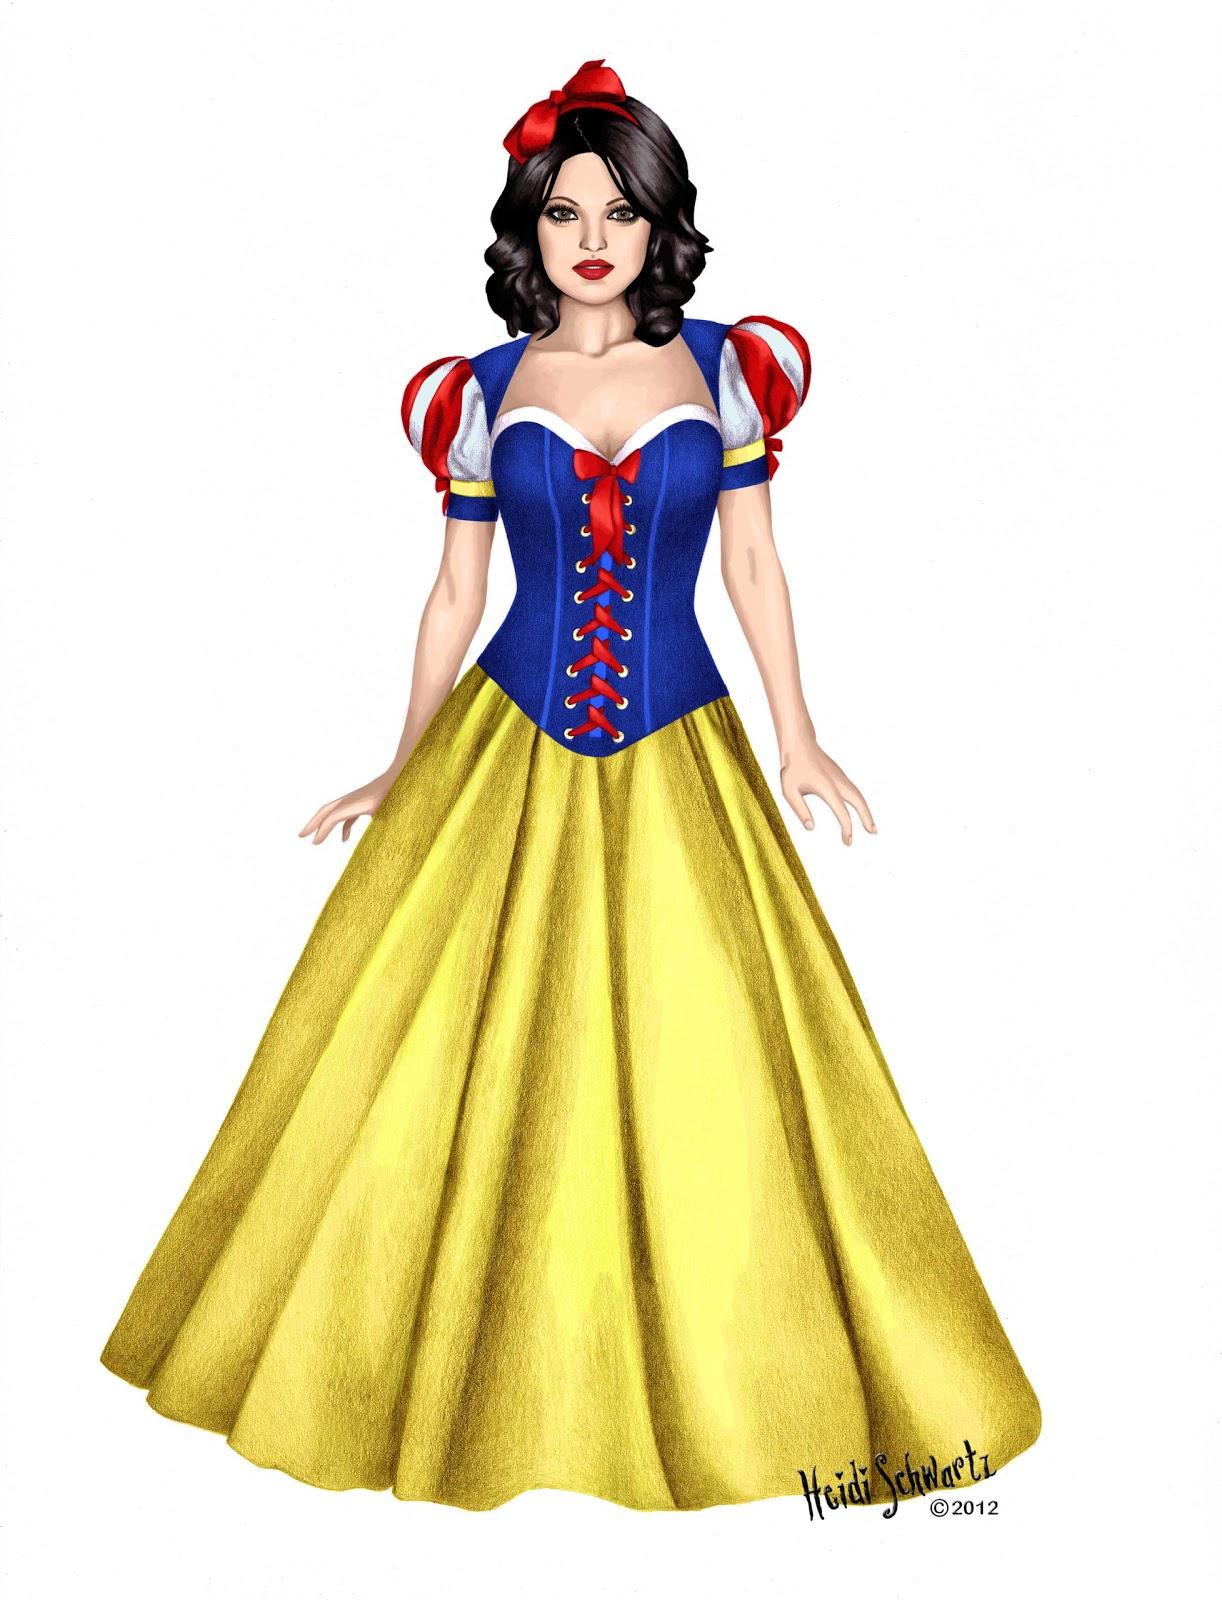 Heidi Schwartz: Classic Snow White Character Development